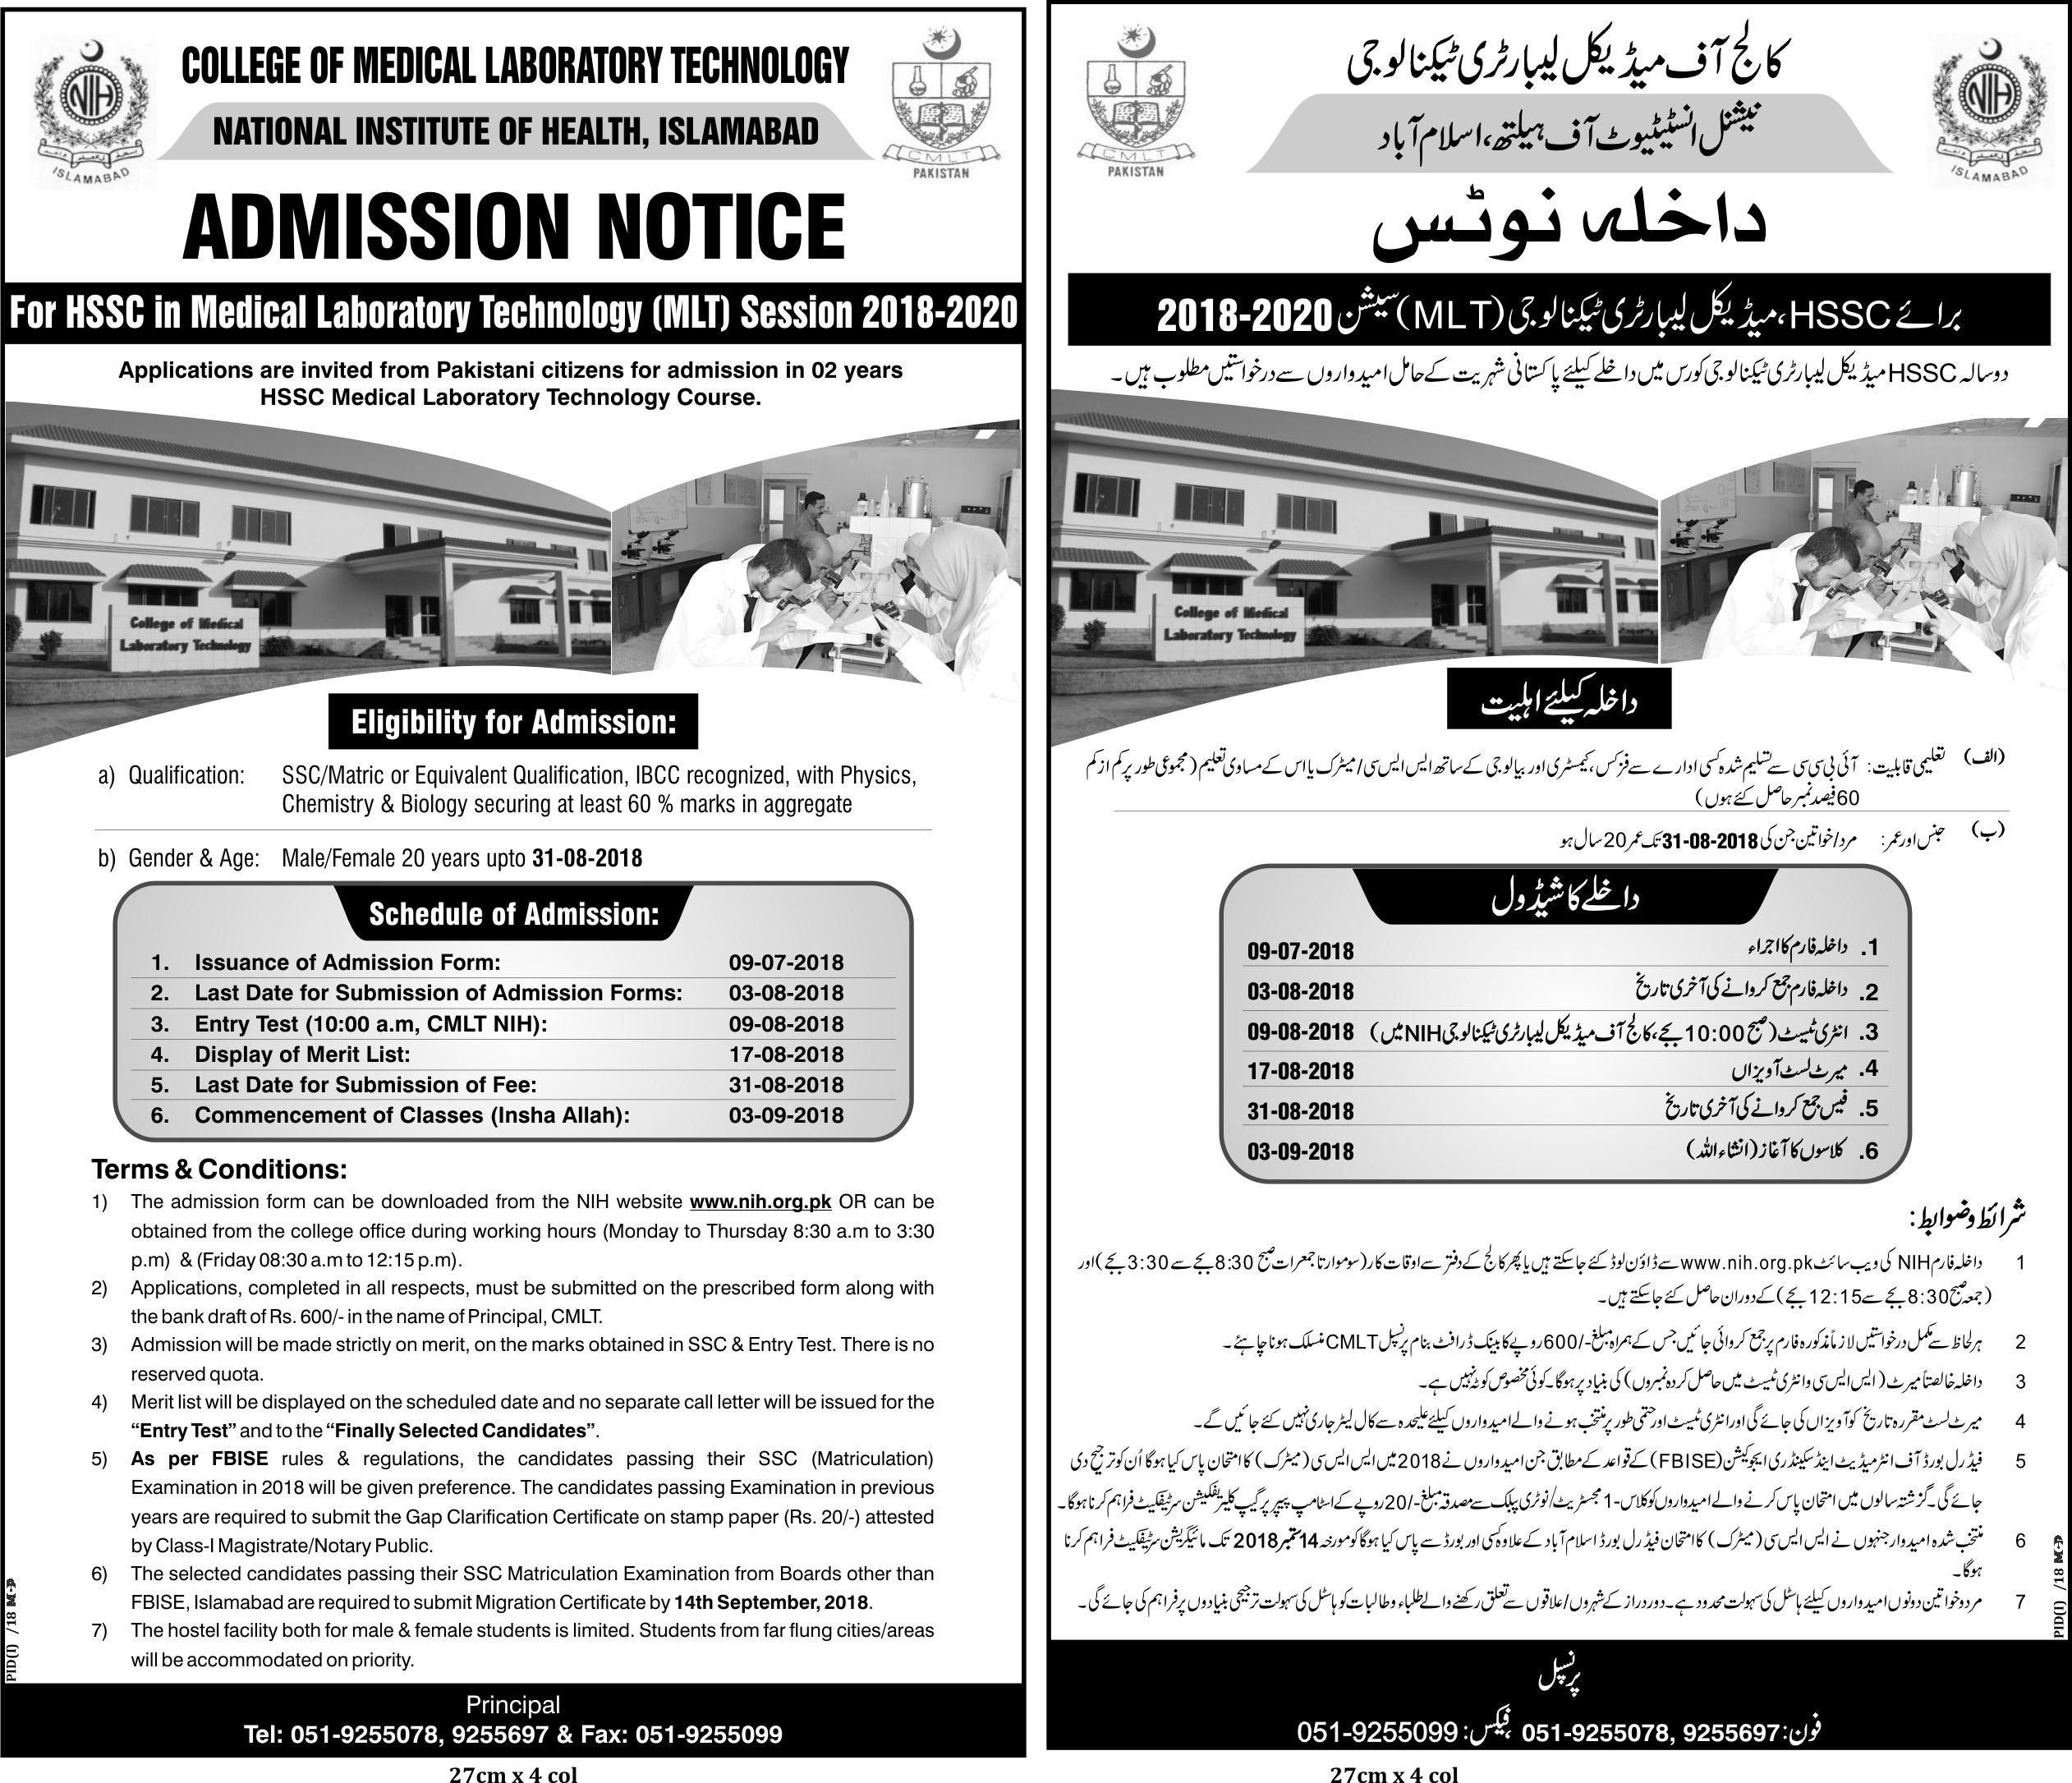 College Of Medical Laboratory Technology Admission 2018 Entry Test Result, Merit List